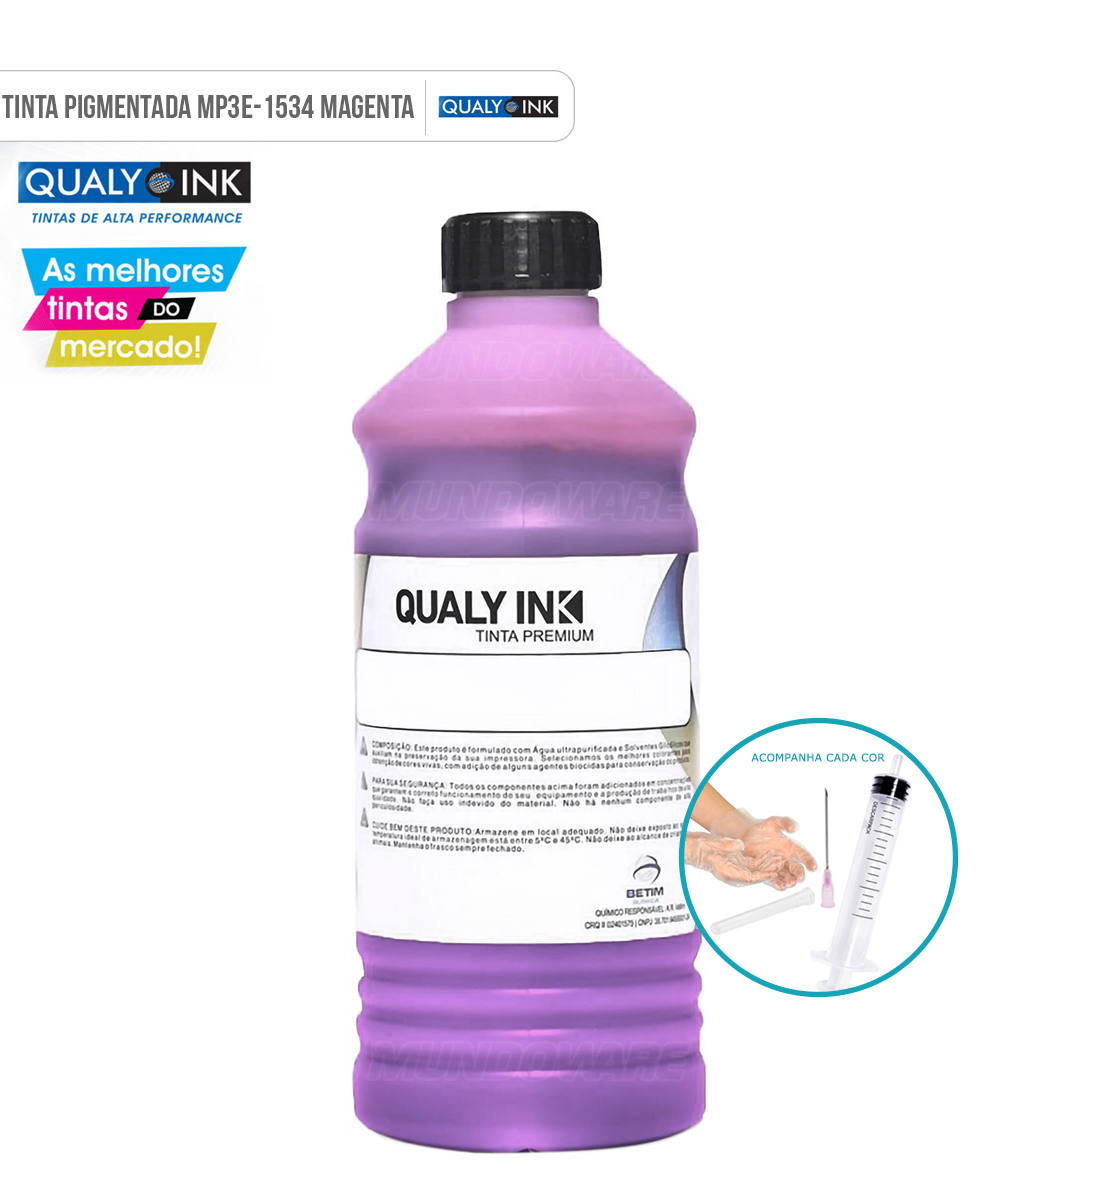 Refil de Tinta Qualy-Ink Magenta Pigmentada para Epson série 544 504 impressoras L3108 L3110 L3111 L3118 L3119 L3150 L3158 L4150 L4158 L4160 L4168 L5190 L6160 L6161 L6168 L6170 L6171 L6178 L6190 L6191 L6198